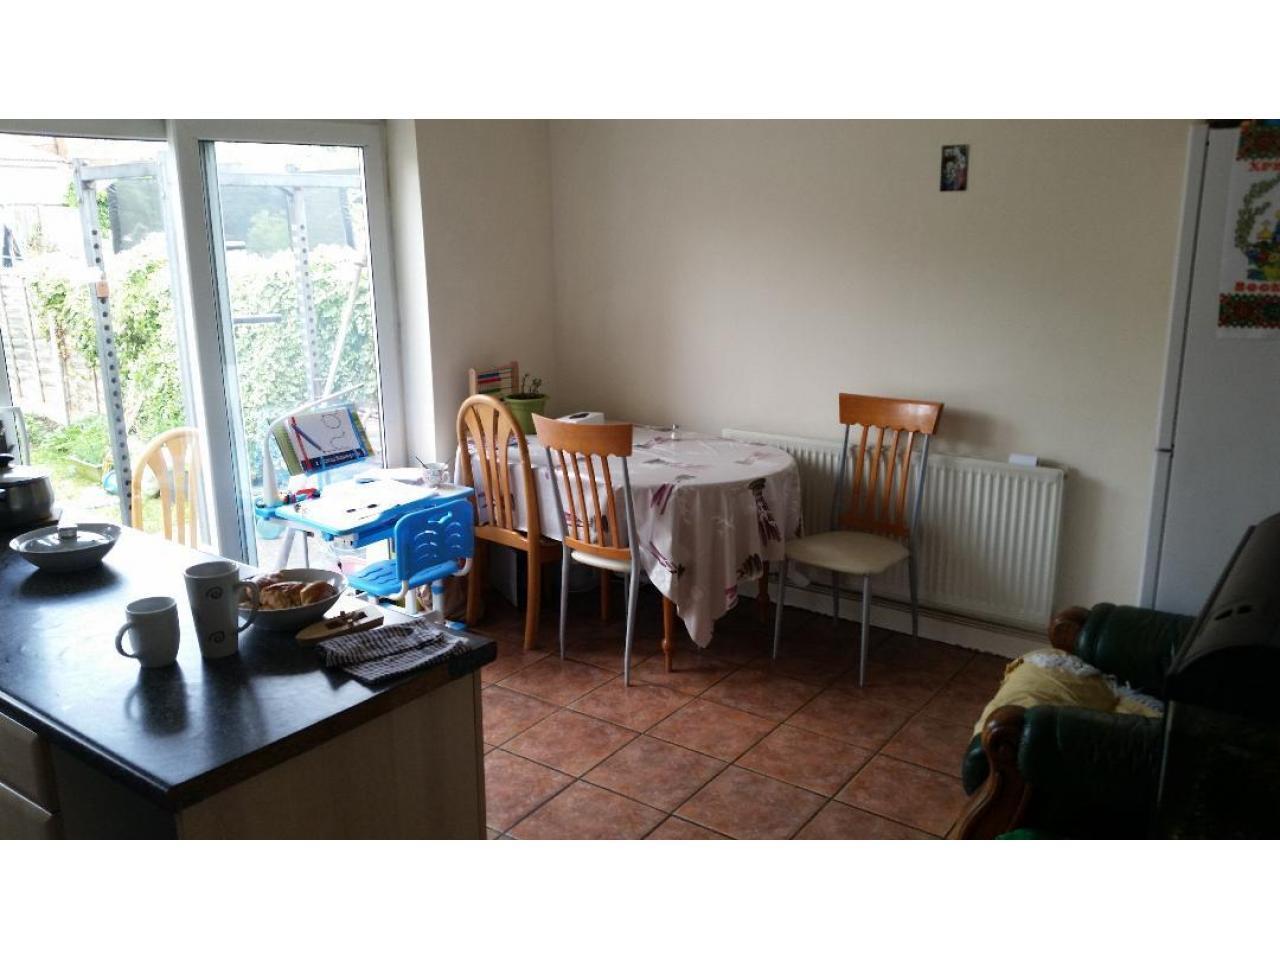 Сдаем  Double Room Hounslow  TW3 4AW £115 в неделю - 5